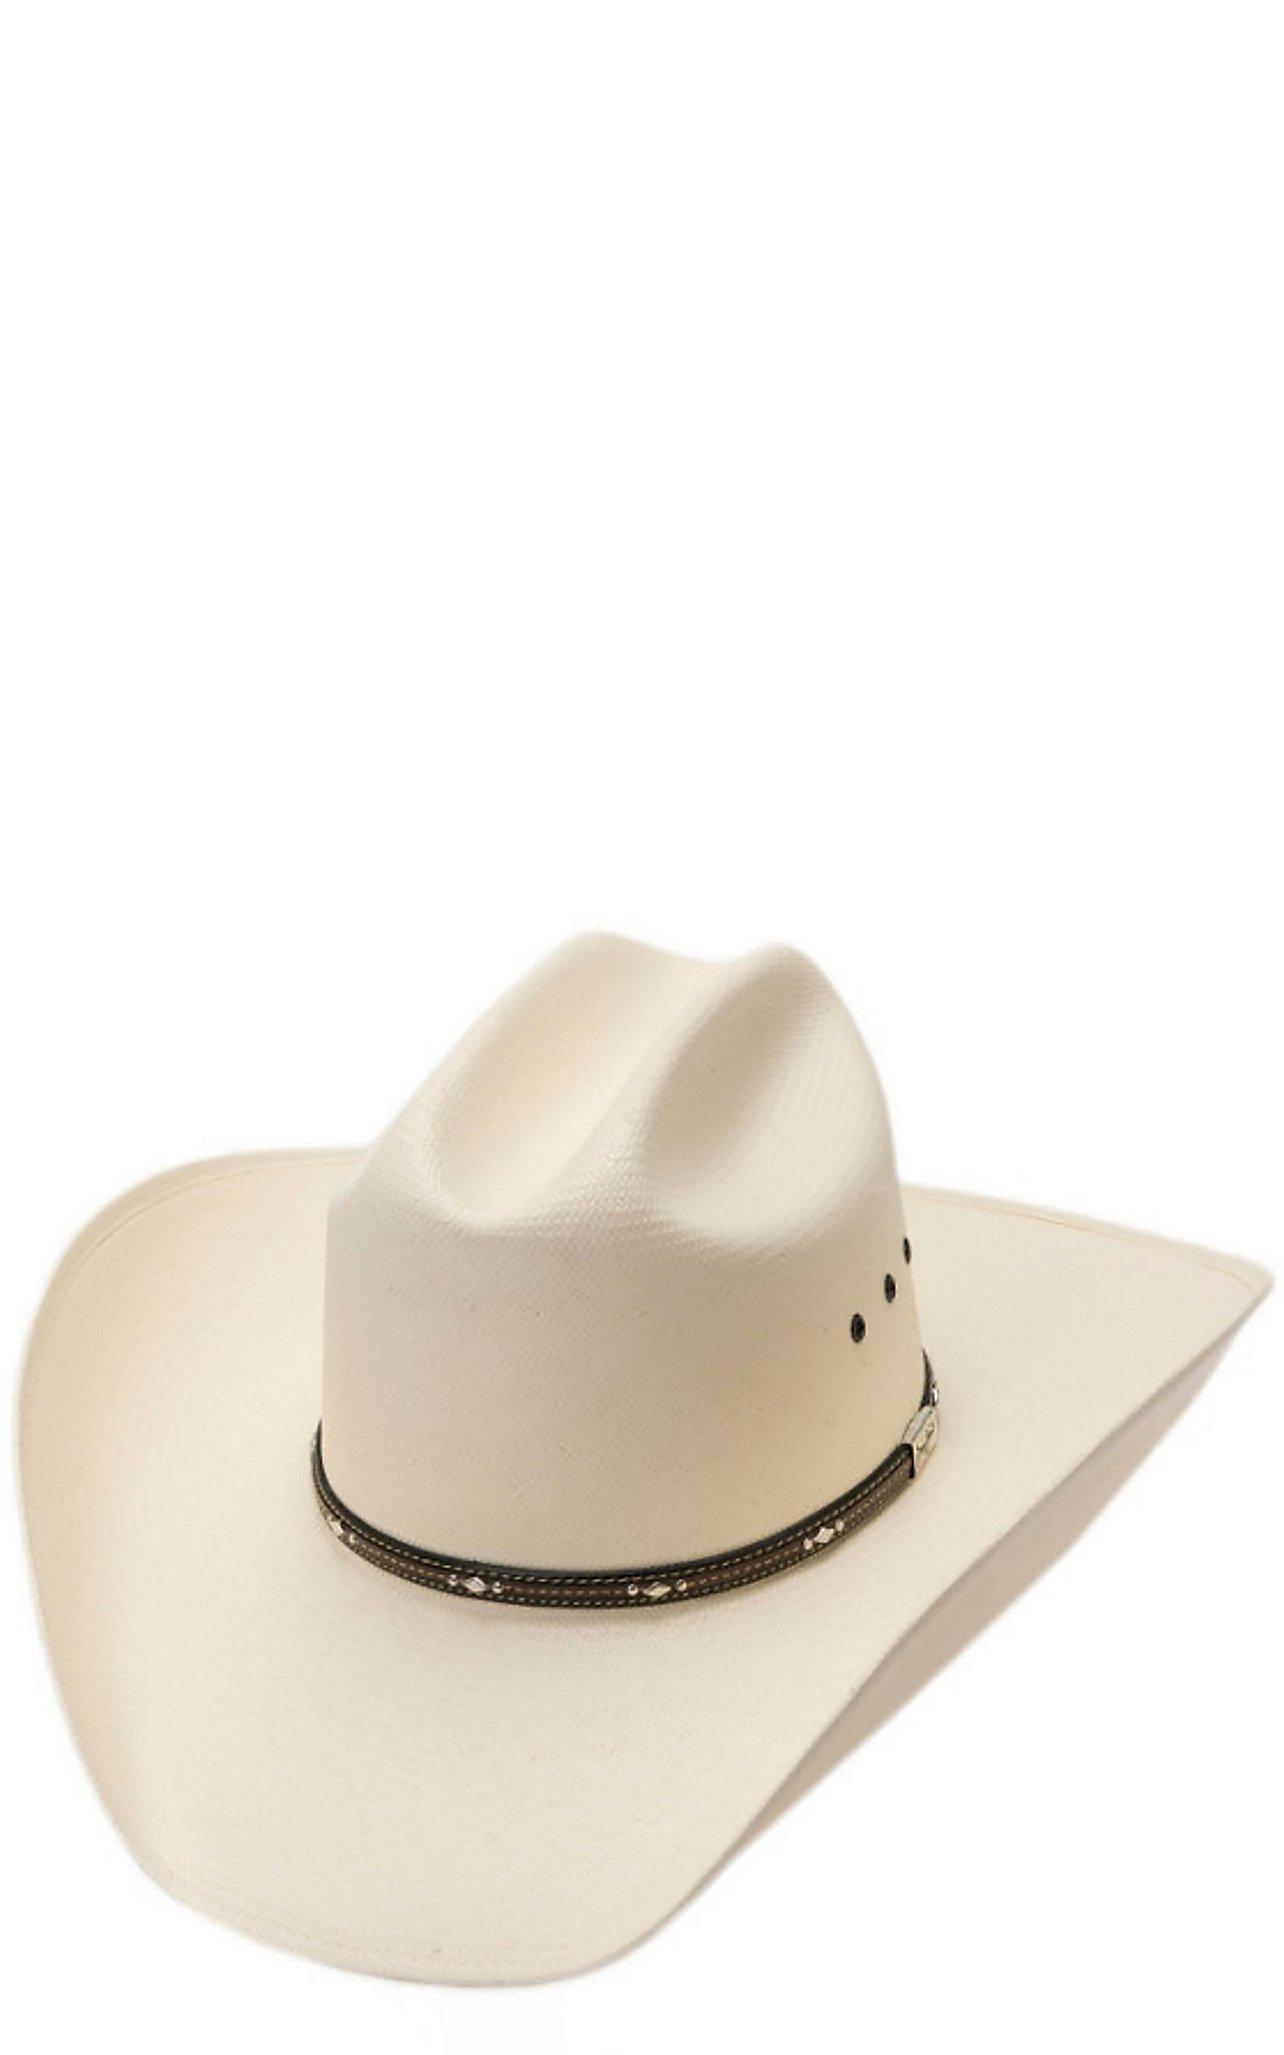 Resistol 10X George Strait Kingman Straw Cowboy Hat  ff03f17b6bf